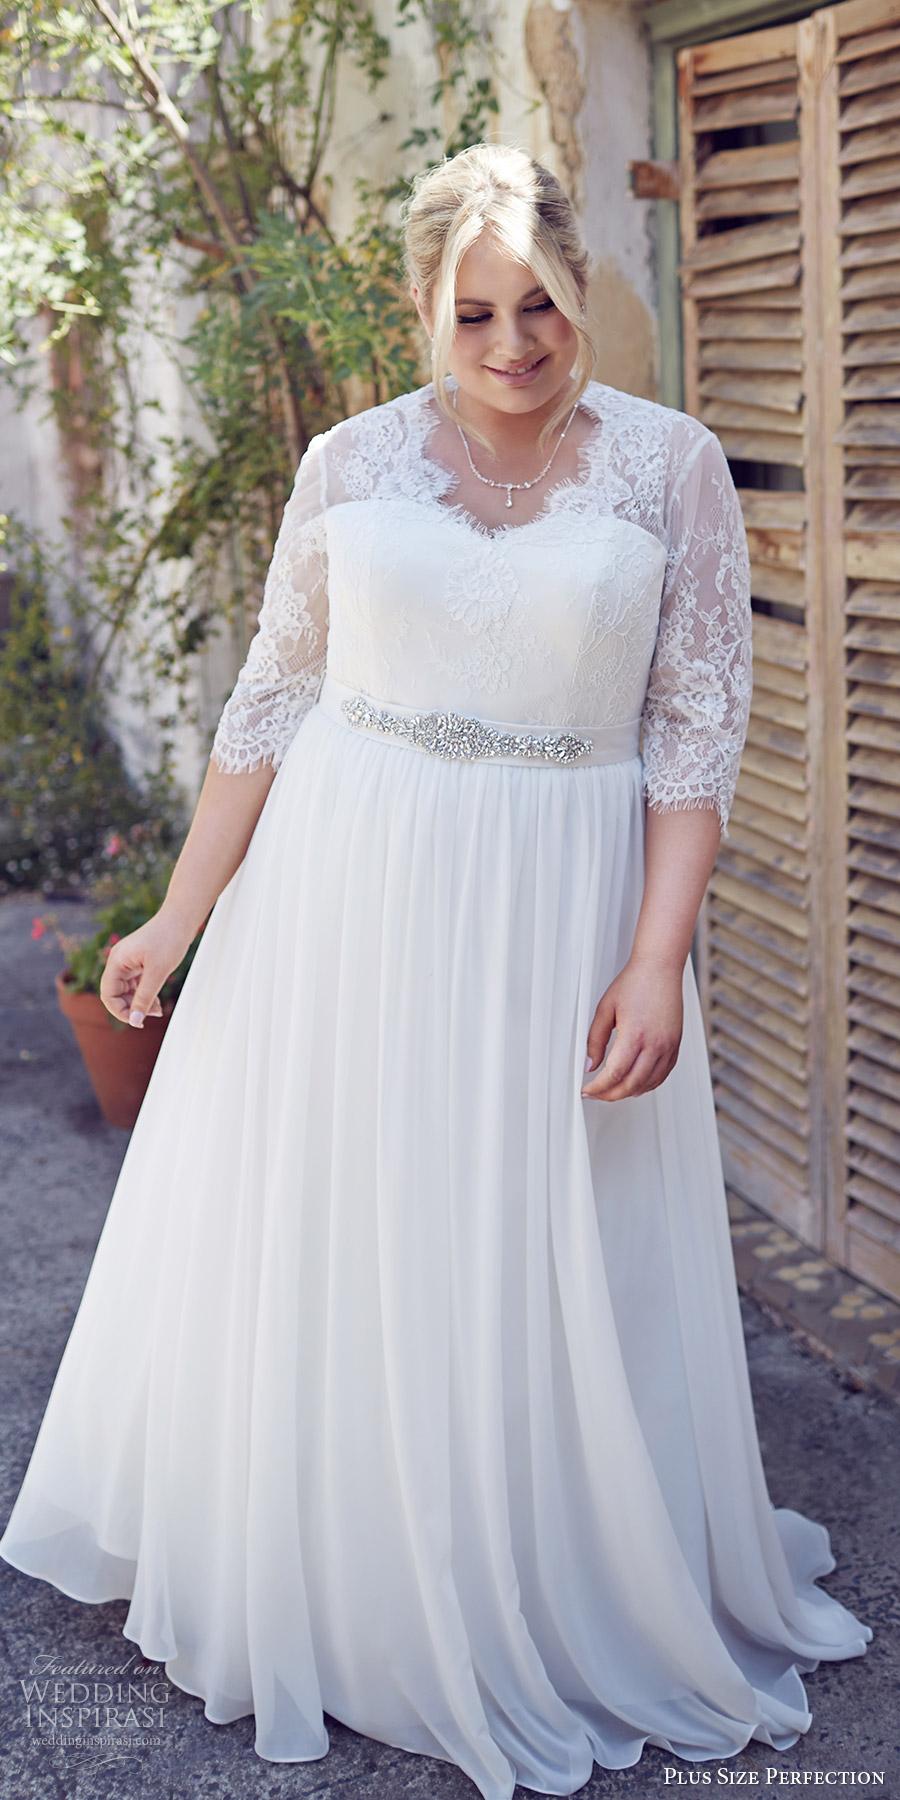 plus size perfection bridal 2016 3 quarter sleeves sweetheart illusion v neck lace bodice a line wedding dress (elegance) mv romantic elegant